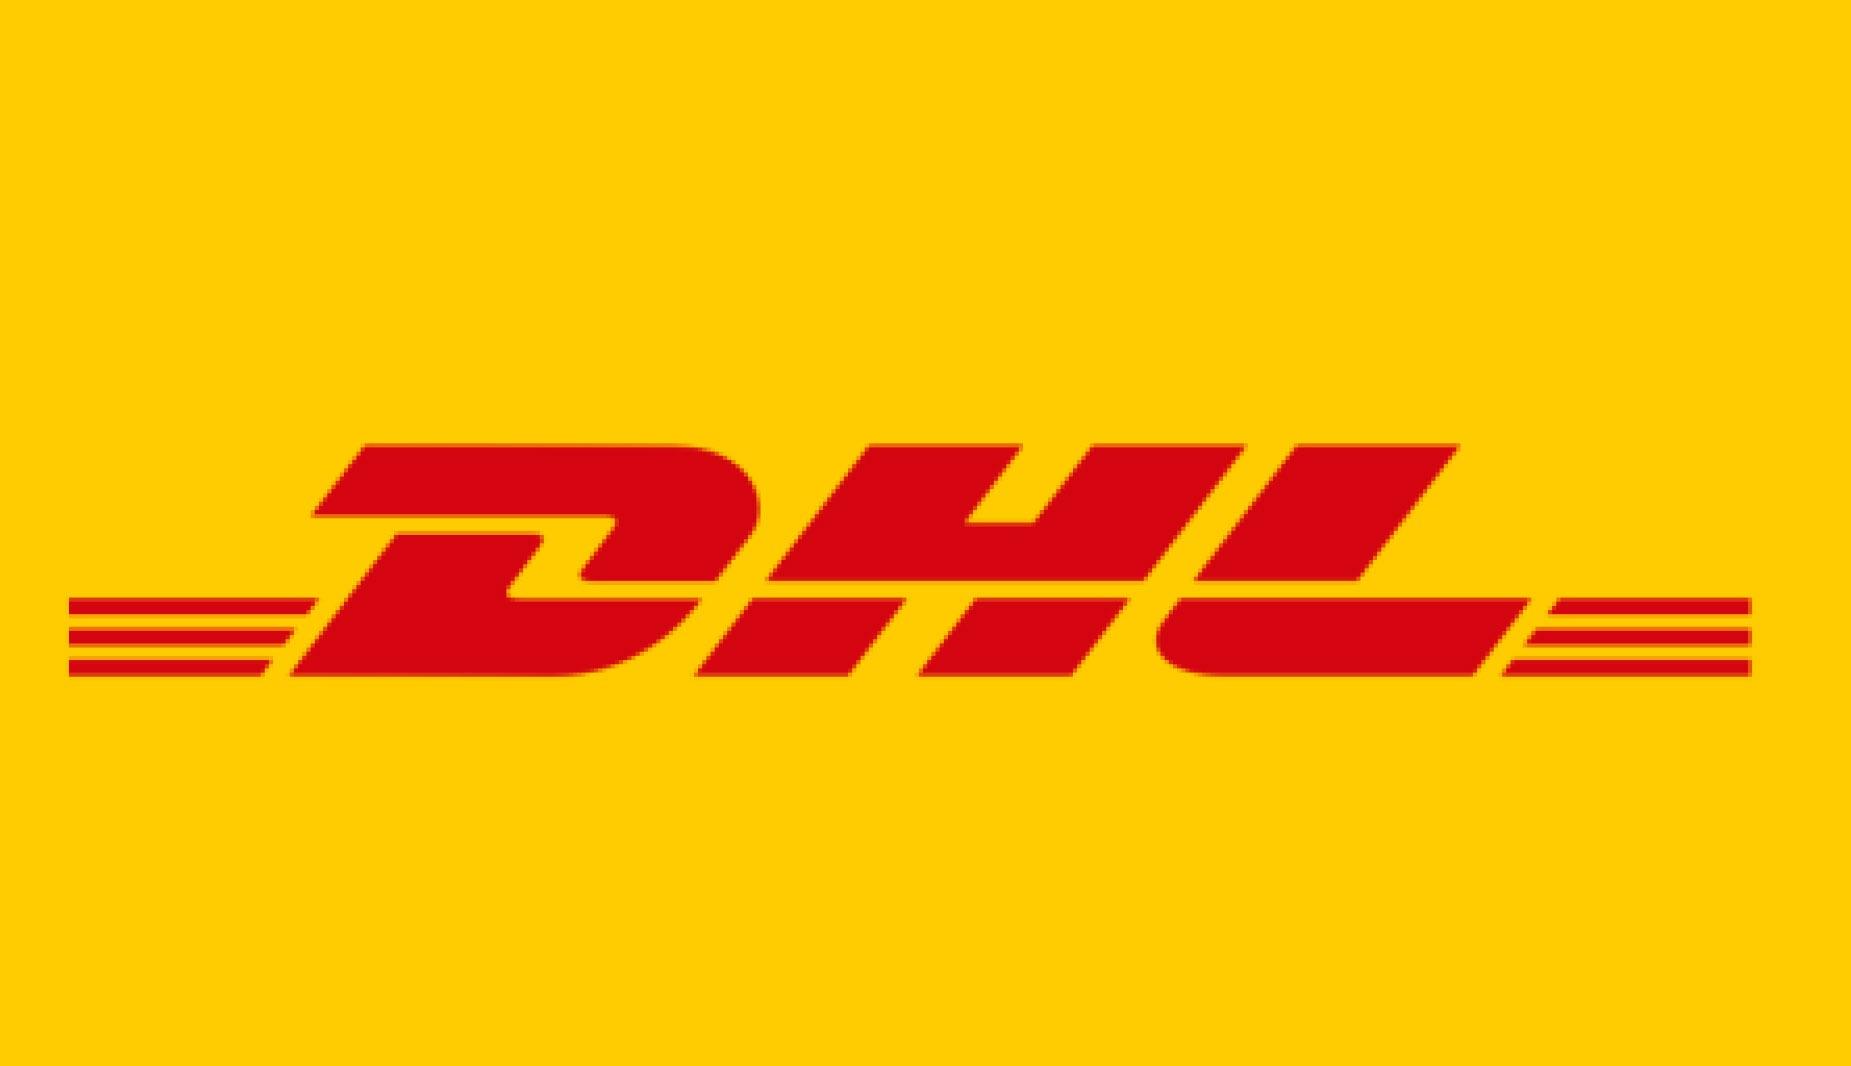 logo-dhl-expedition-express-bijou